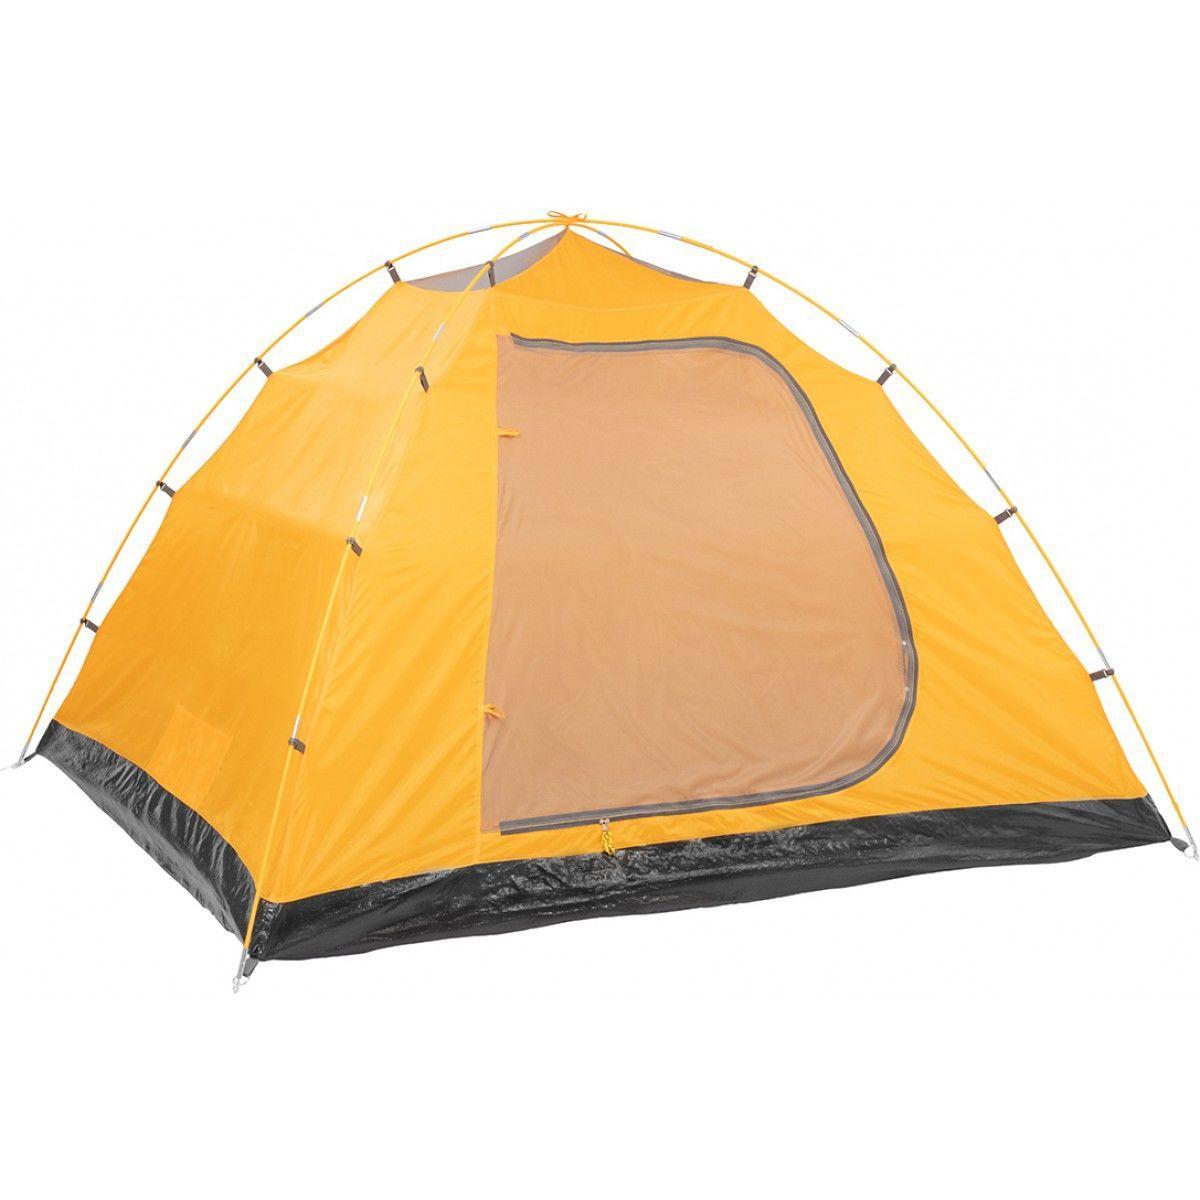 Палатка MUSSON-4 Helios зеленый-оранжевый HS-2366-4 GO - фото 5